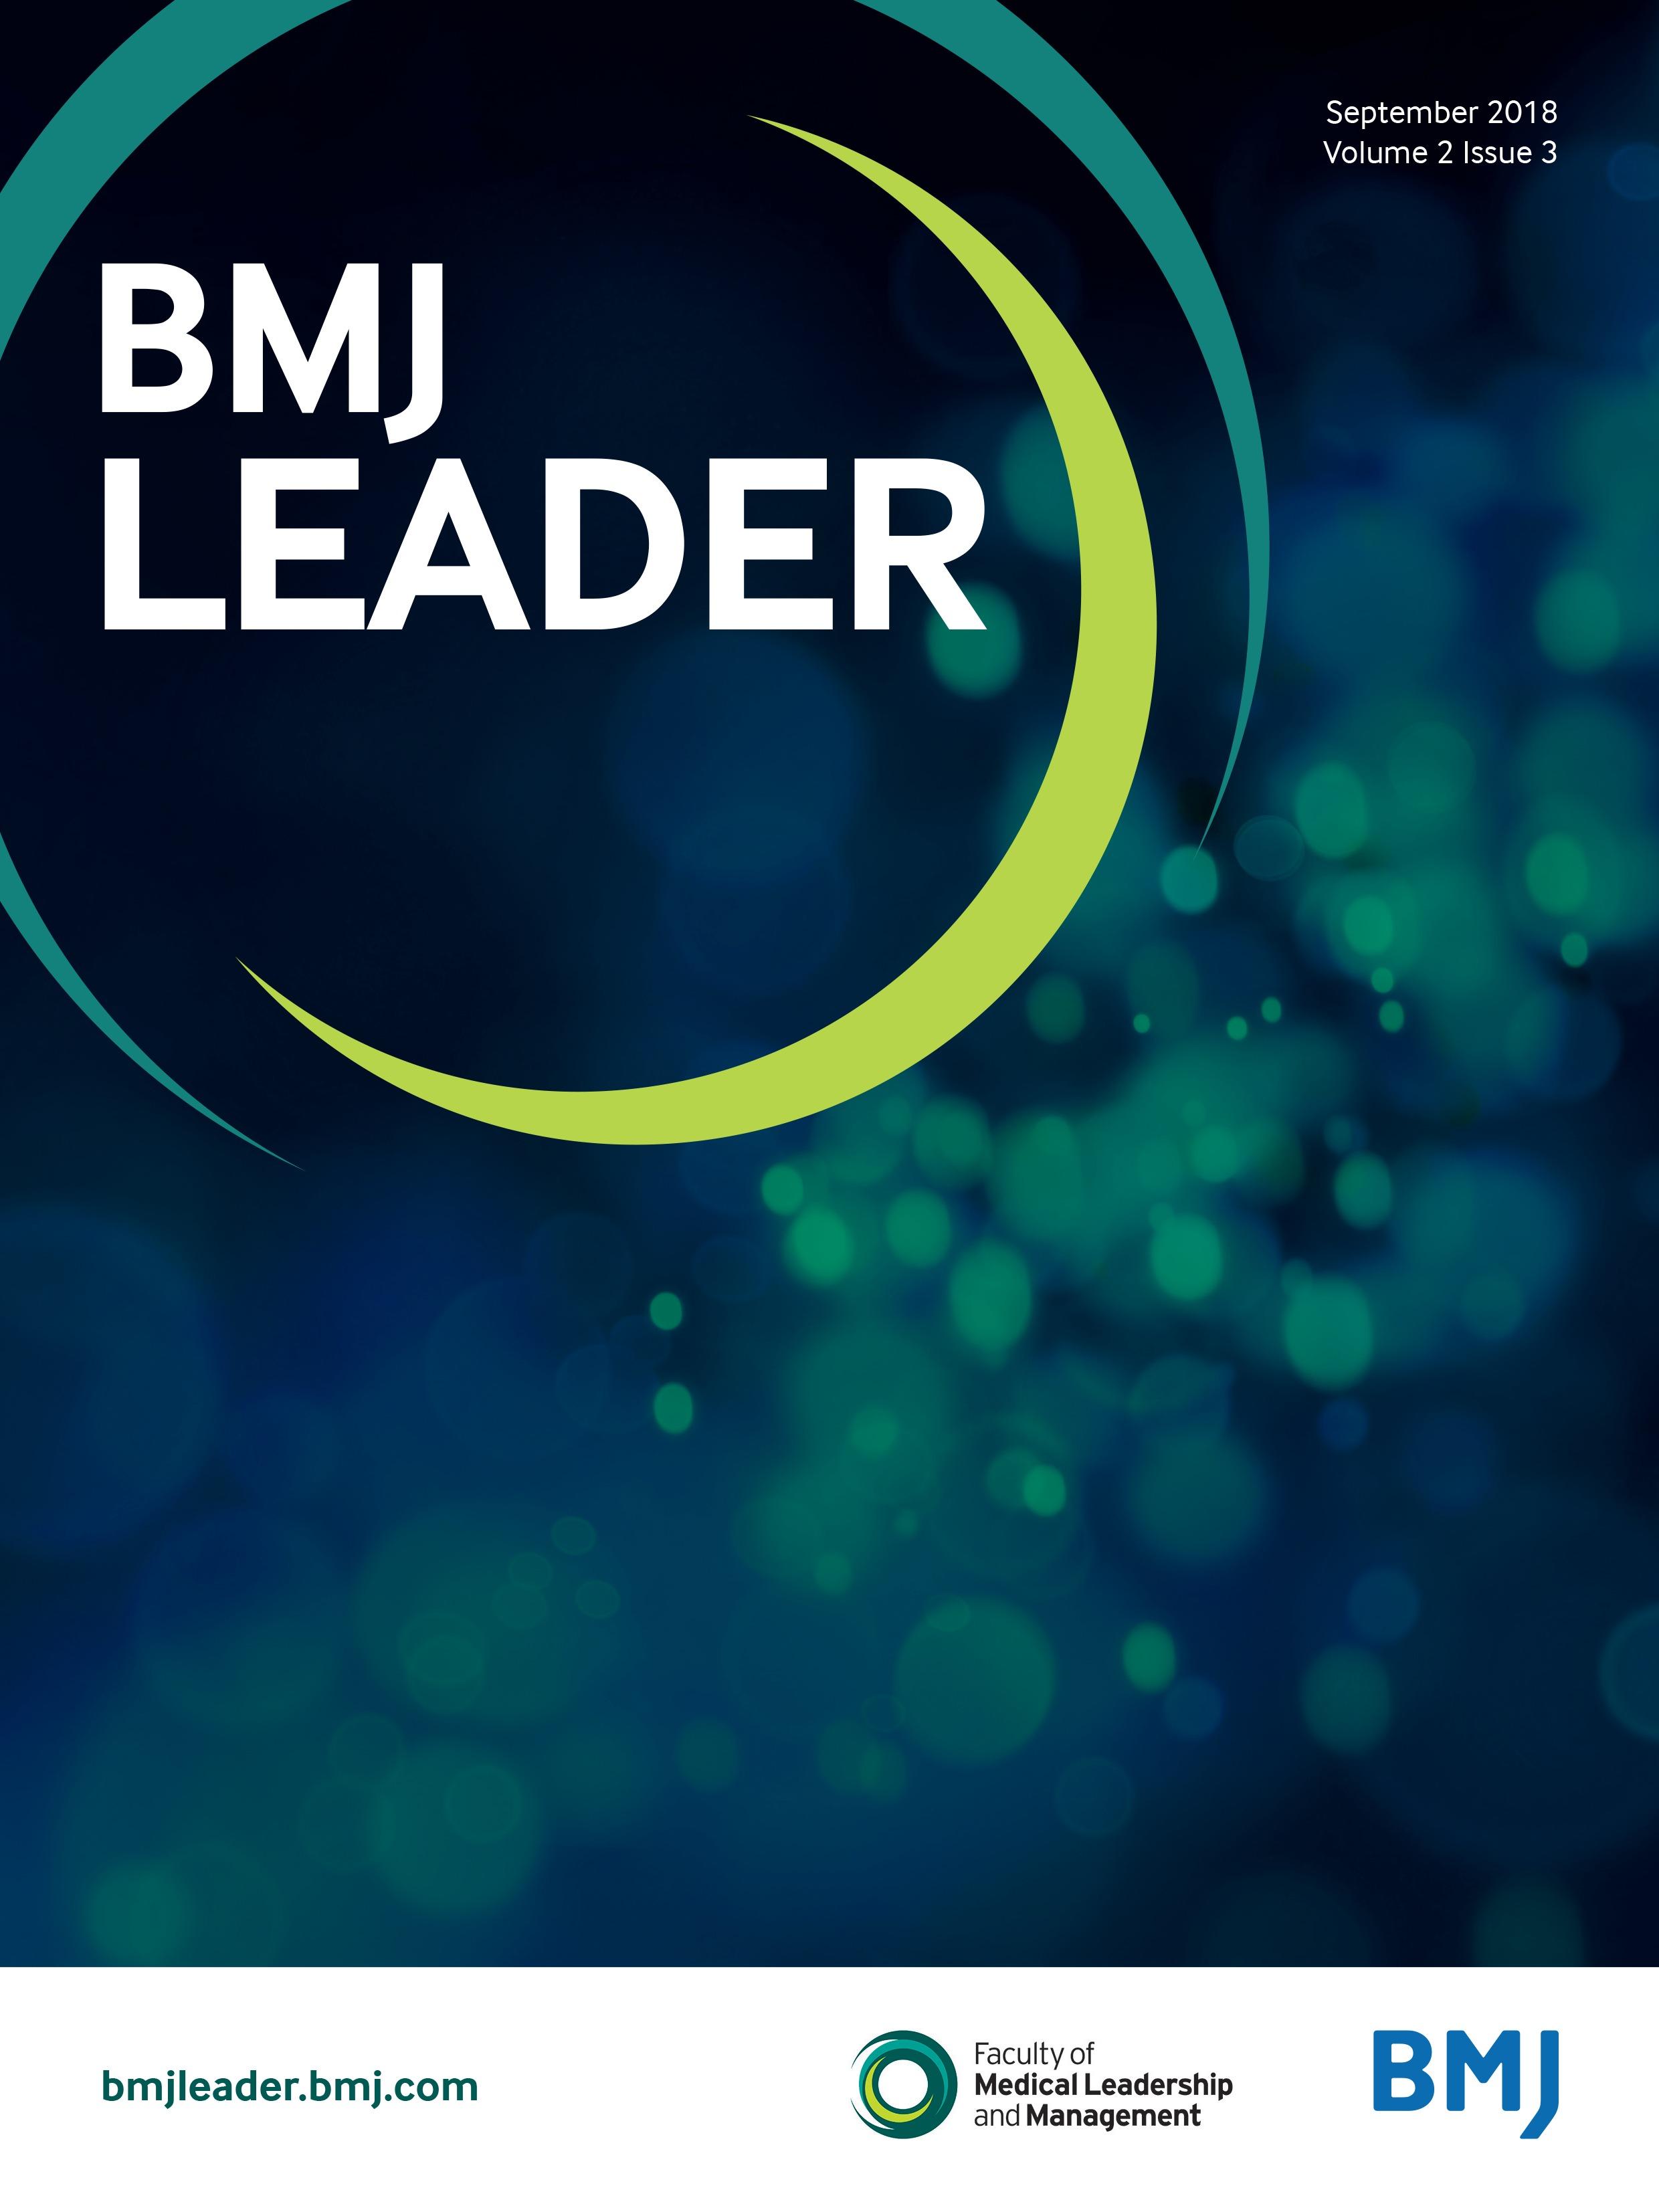 Physician leadership development: towards multidisciplinary